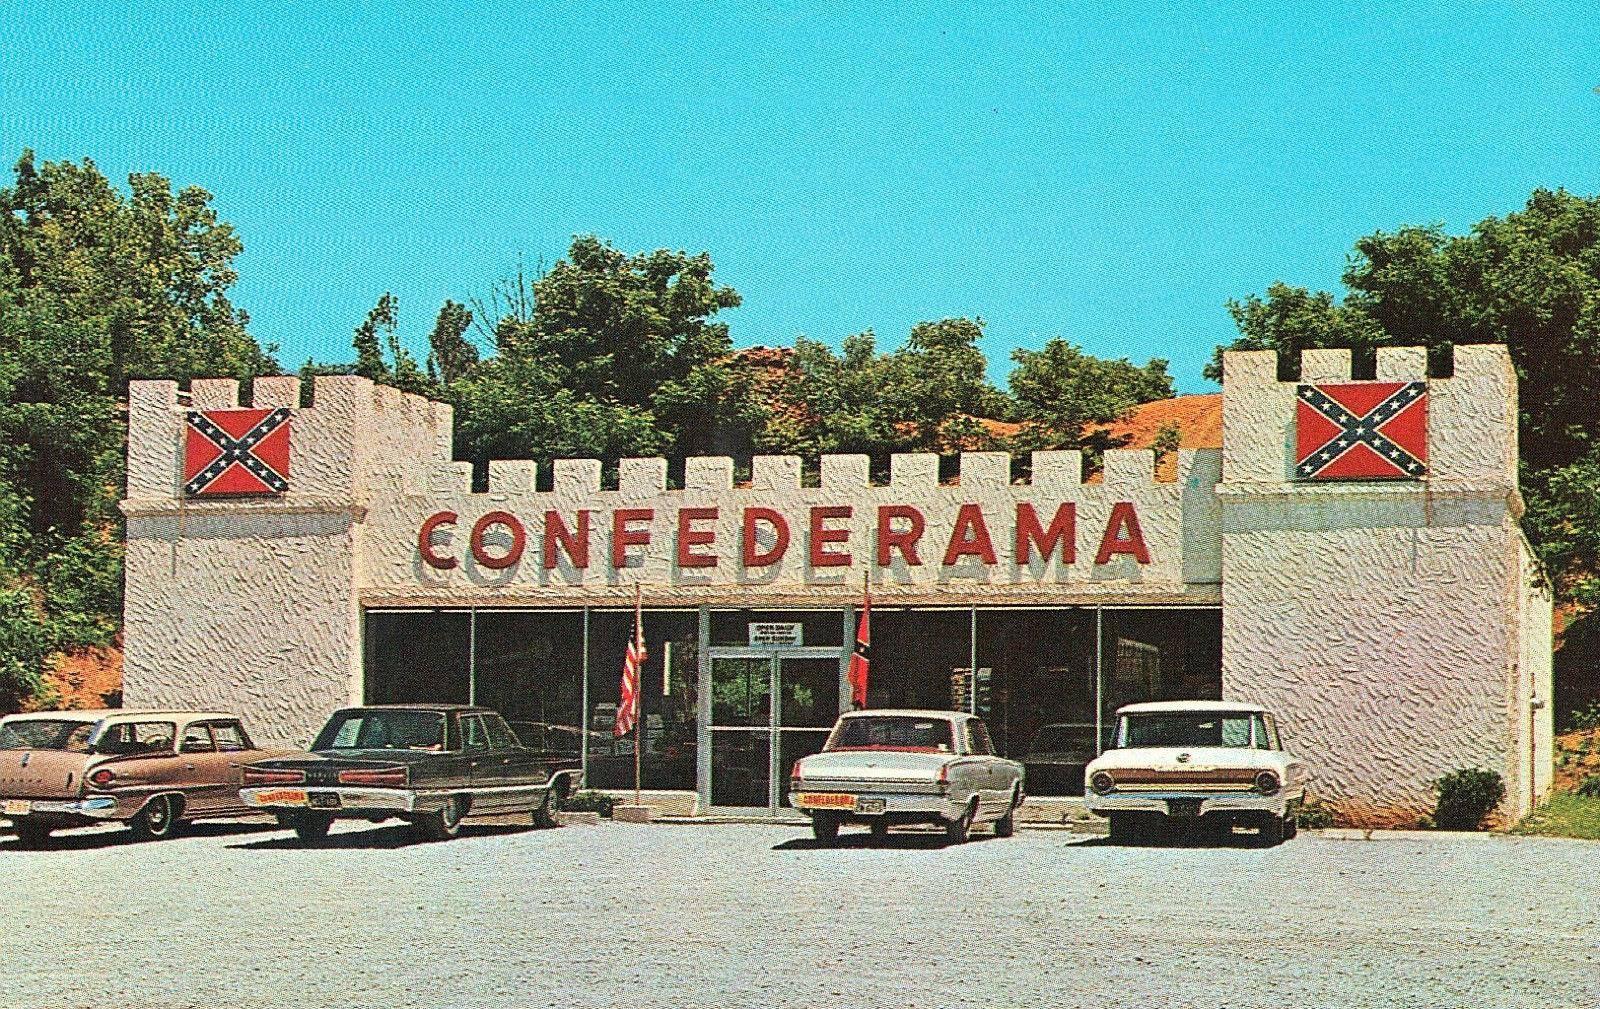 Confederama 1960s St Elmo Chattanooga Tennessee Chattanooga